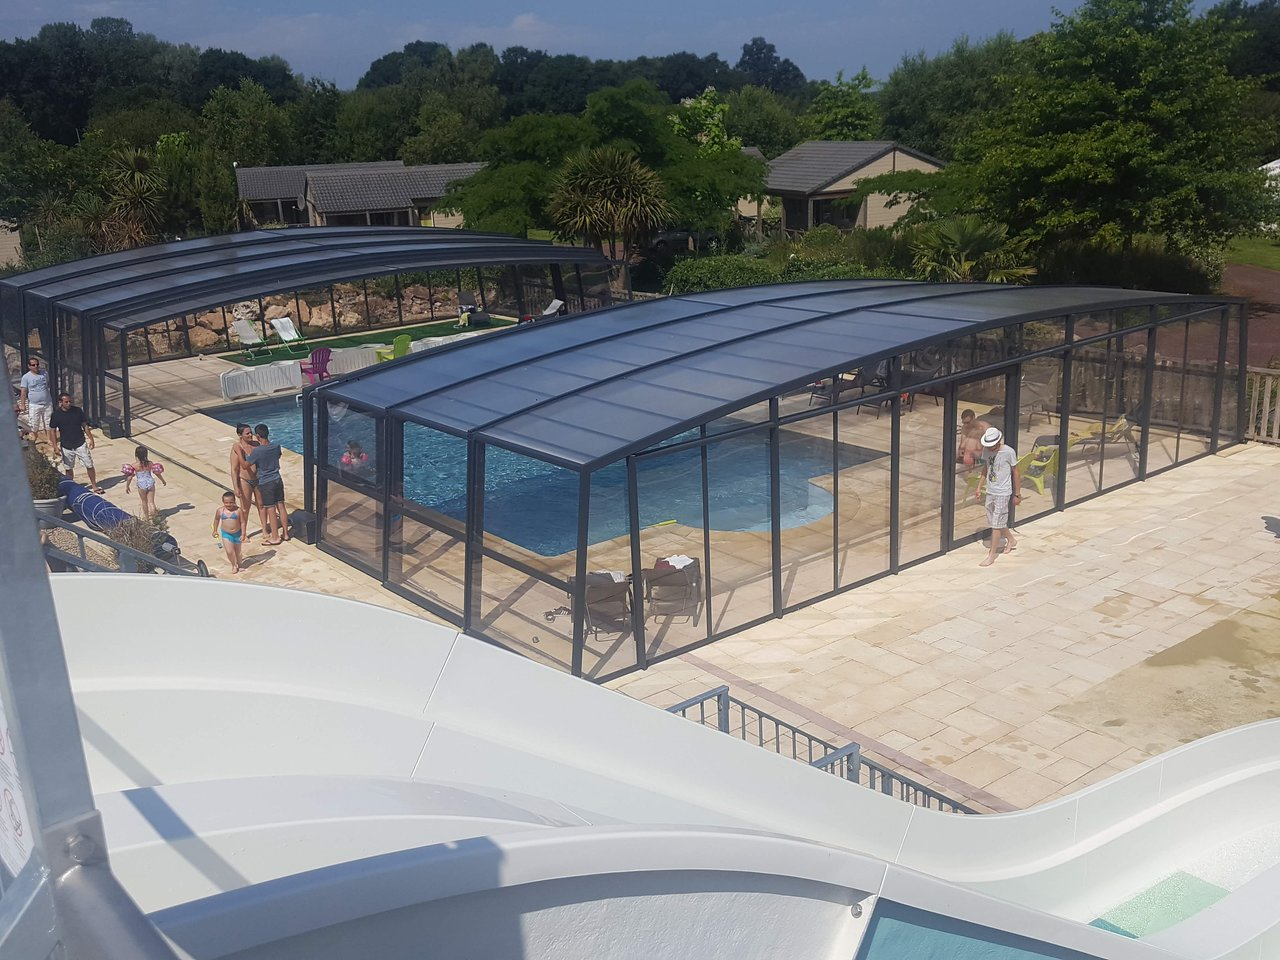 The 5 Best Last Minute Hotels In Ploermel 2020 - Tripadvisor concernant Piscine Locminé